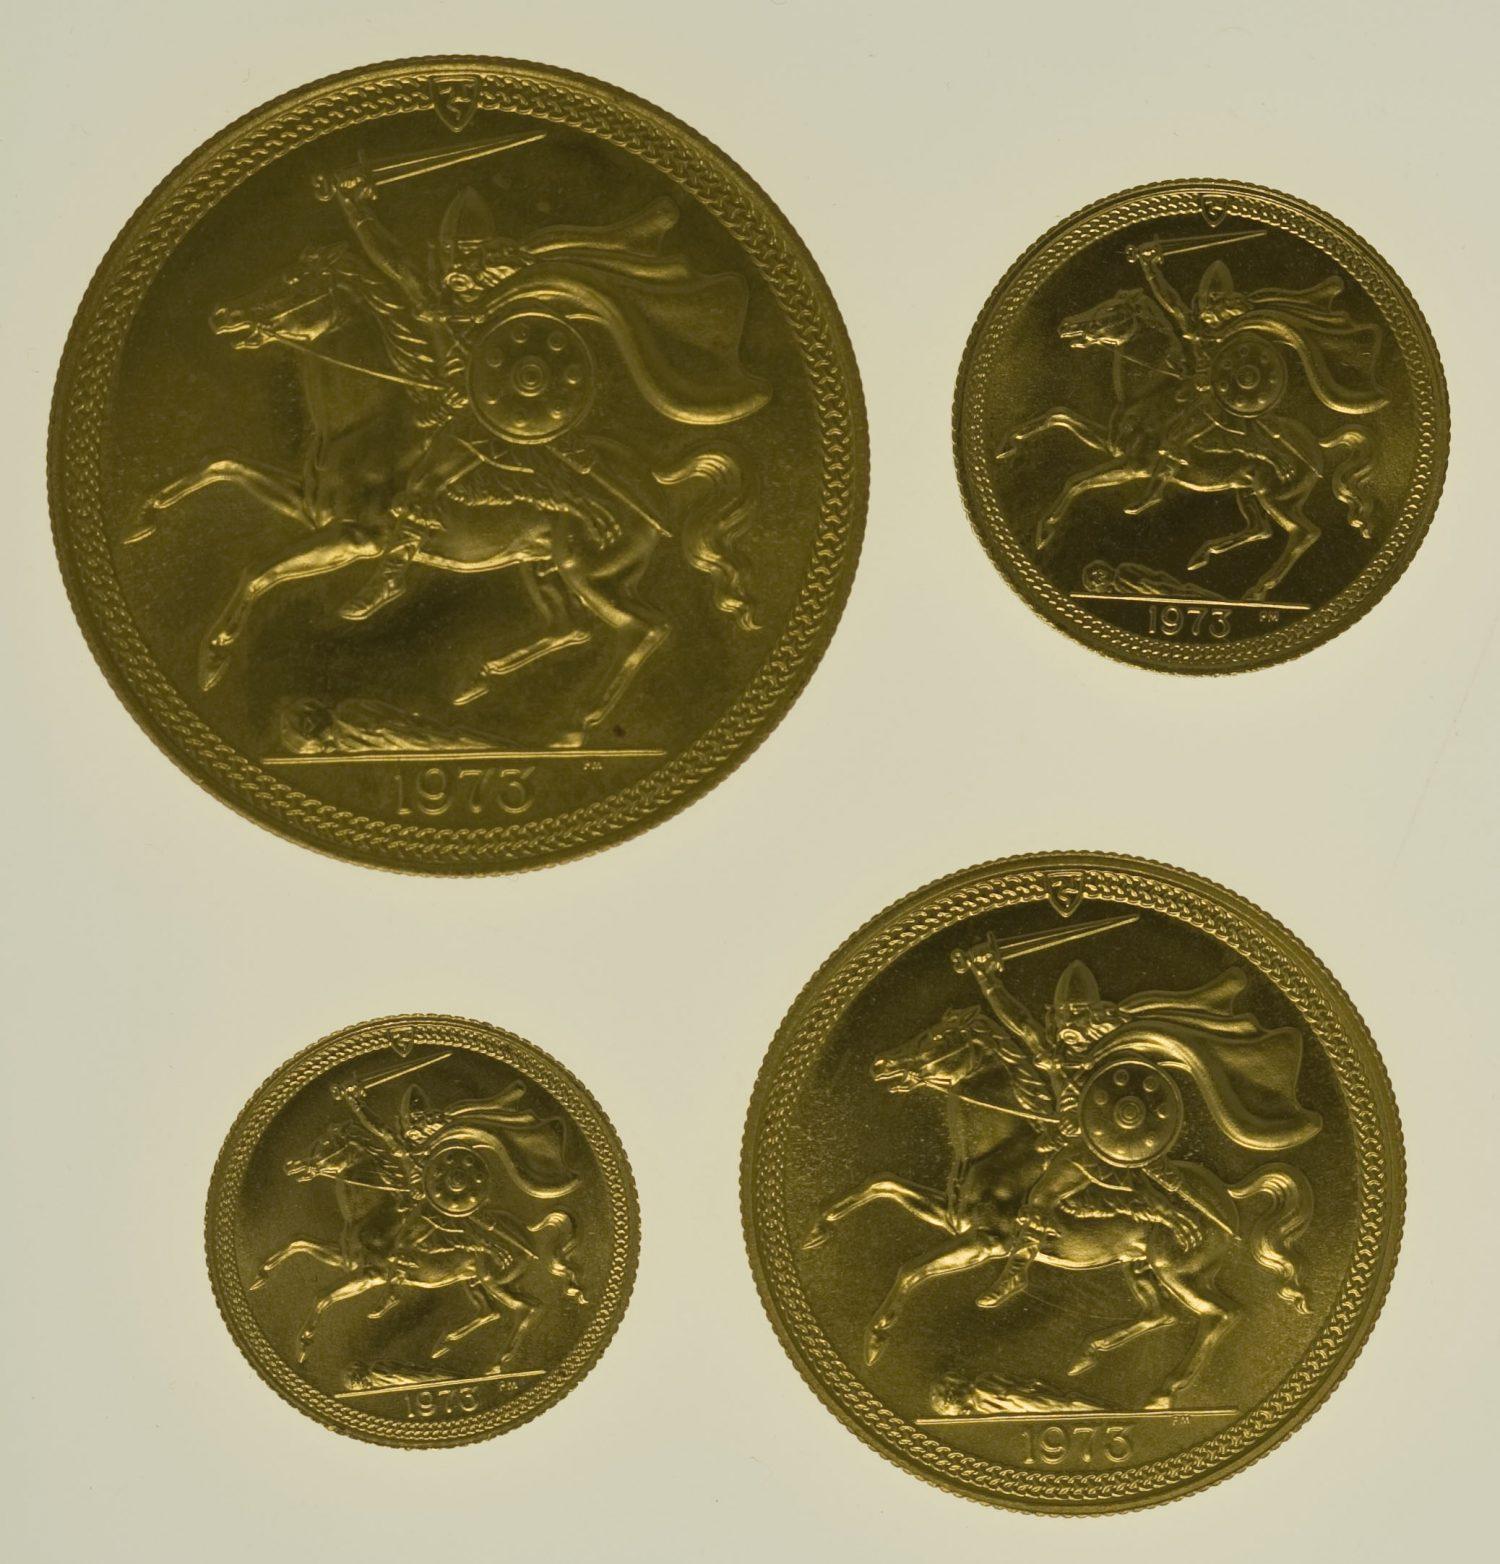 isle-of-man - Isle of Man Elisabeth II. 4 Coin Set 1973